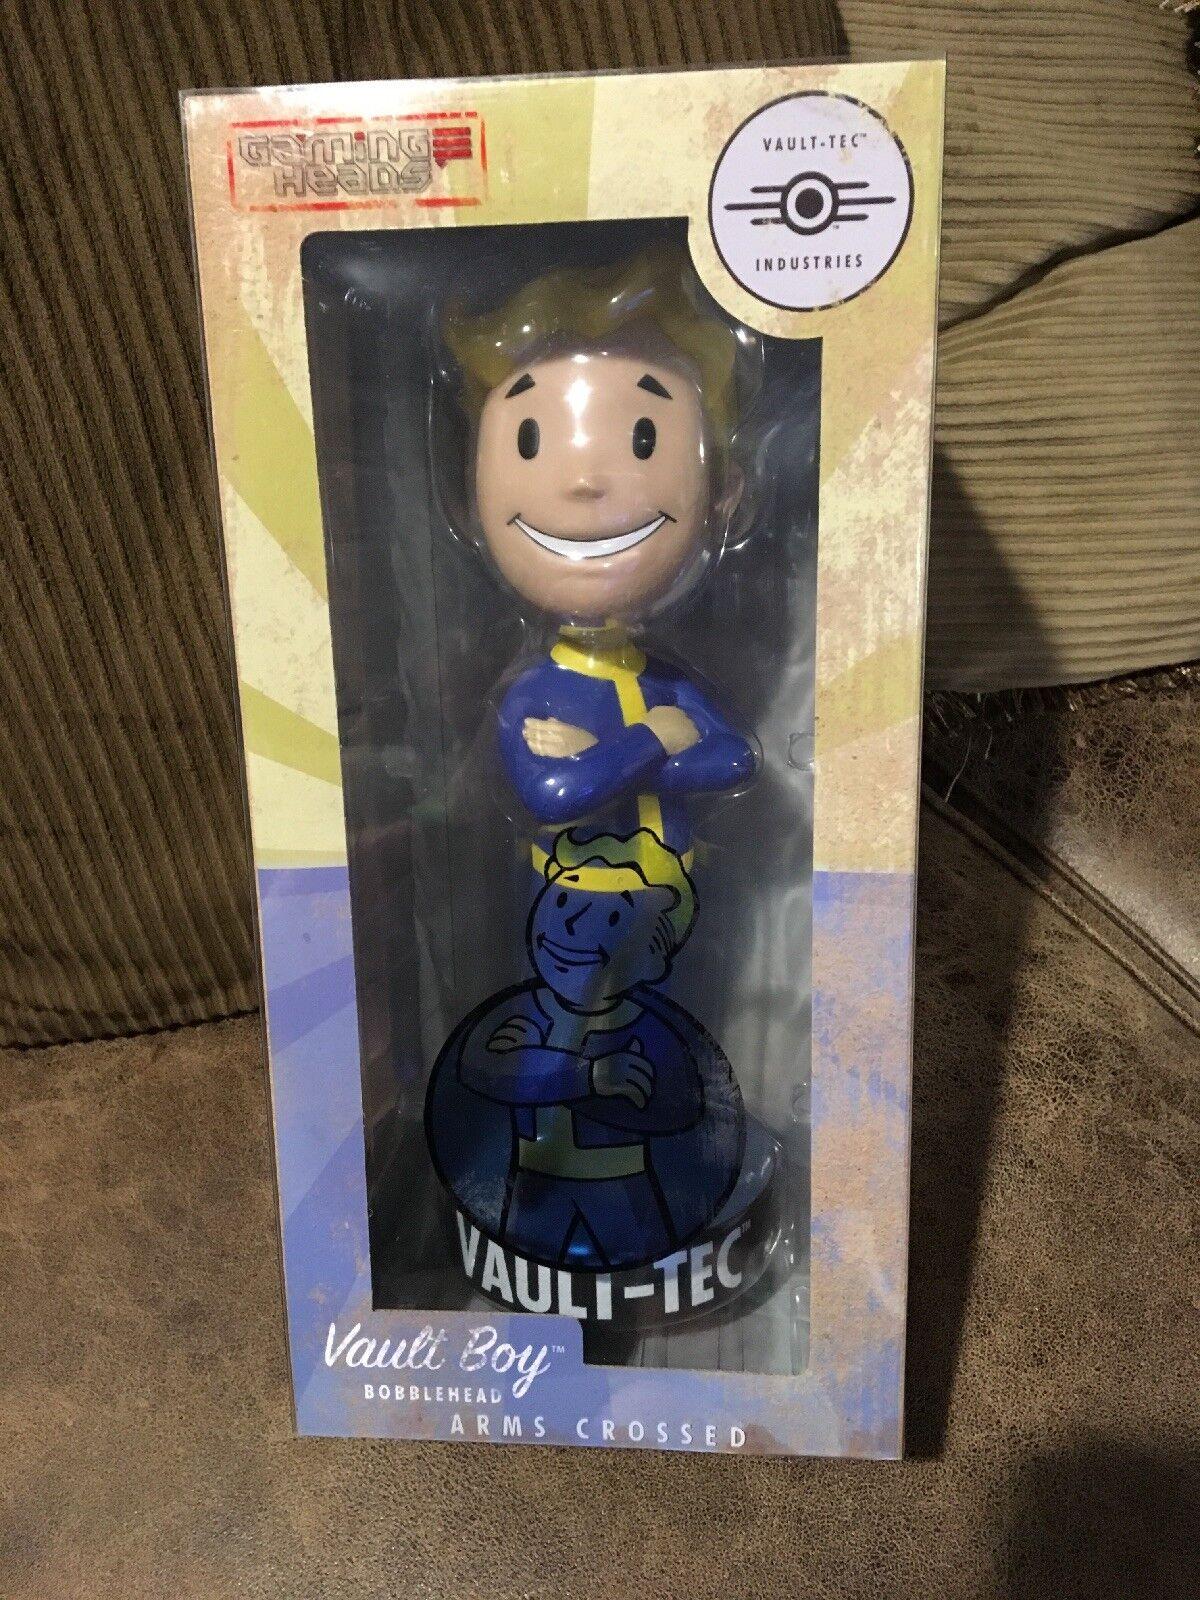 Gaming Heads Fallout 4 Vault Boy 12  ARMS CROSSED Mega Bobblehead Figure NIB